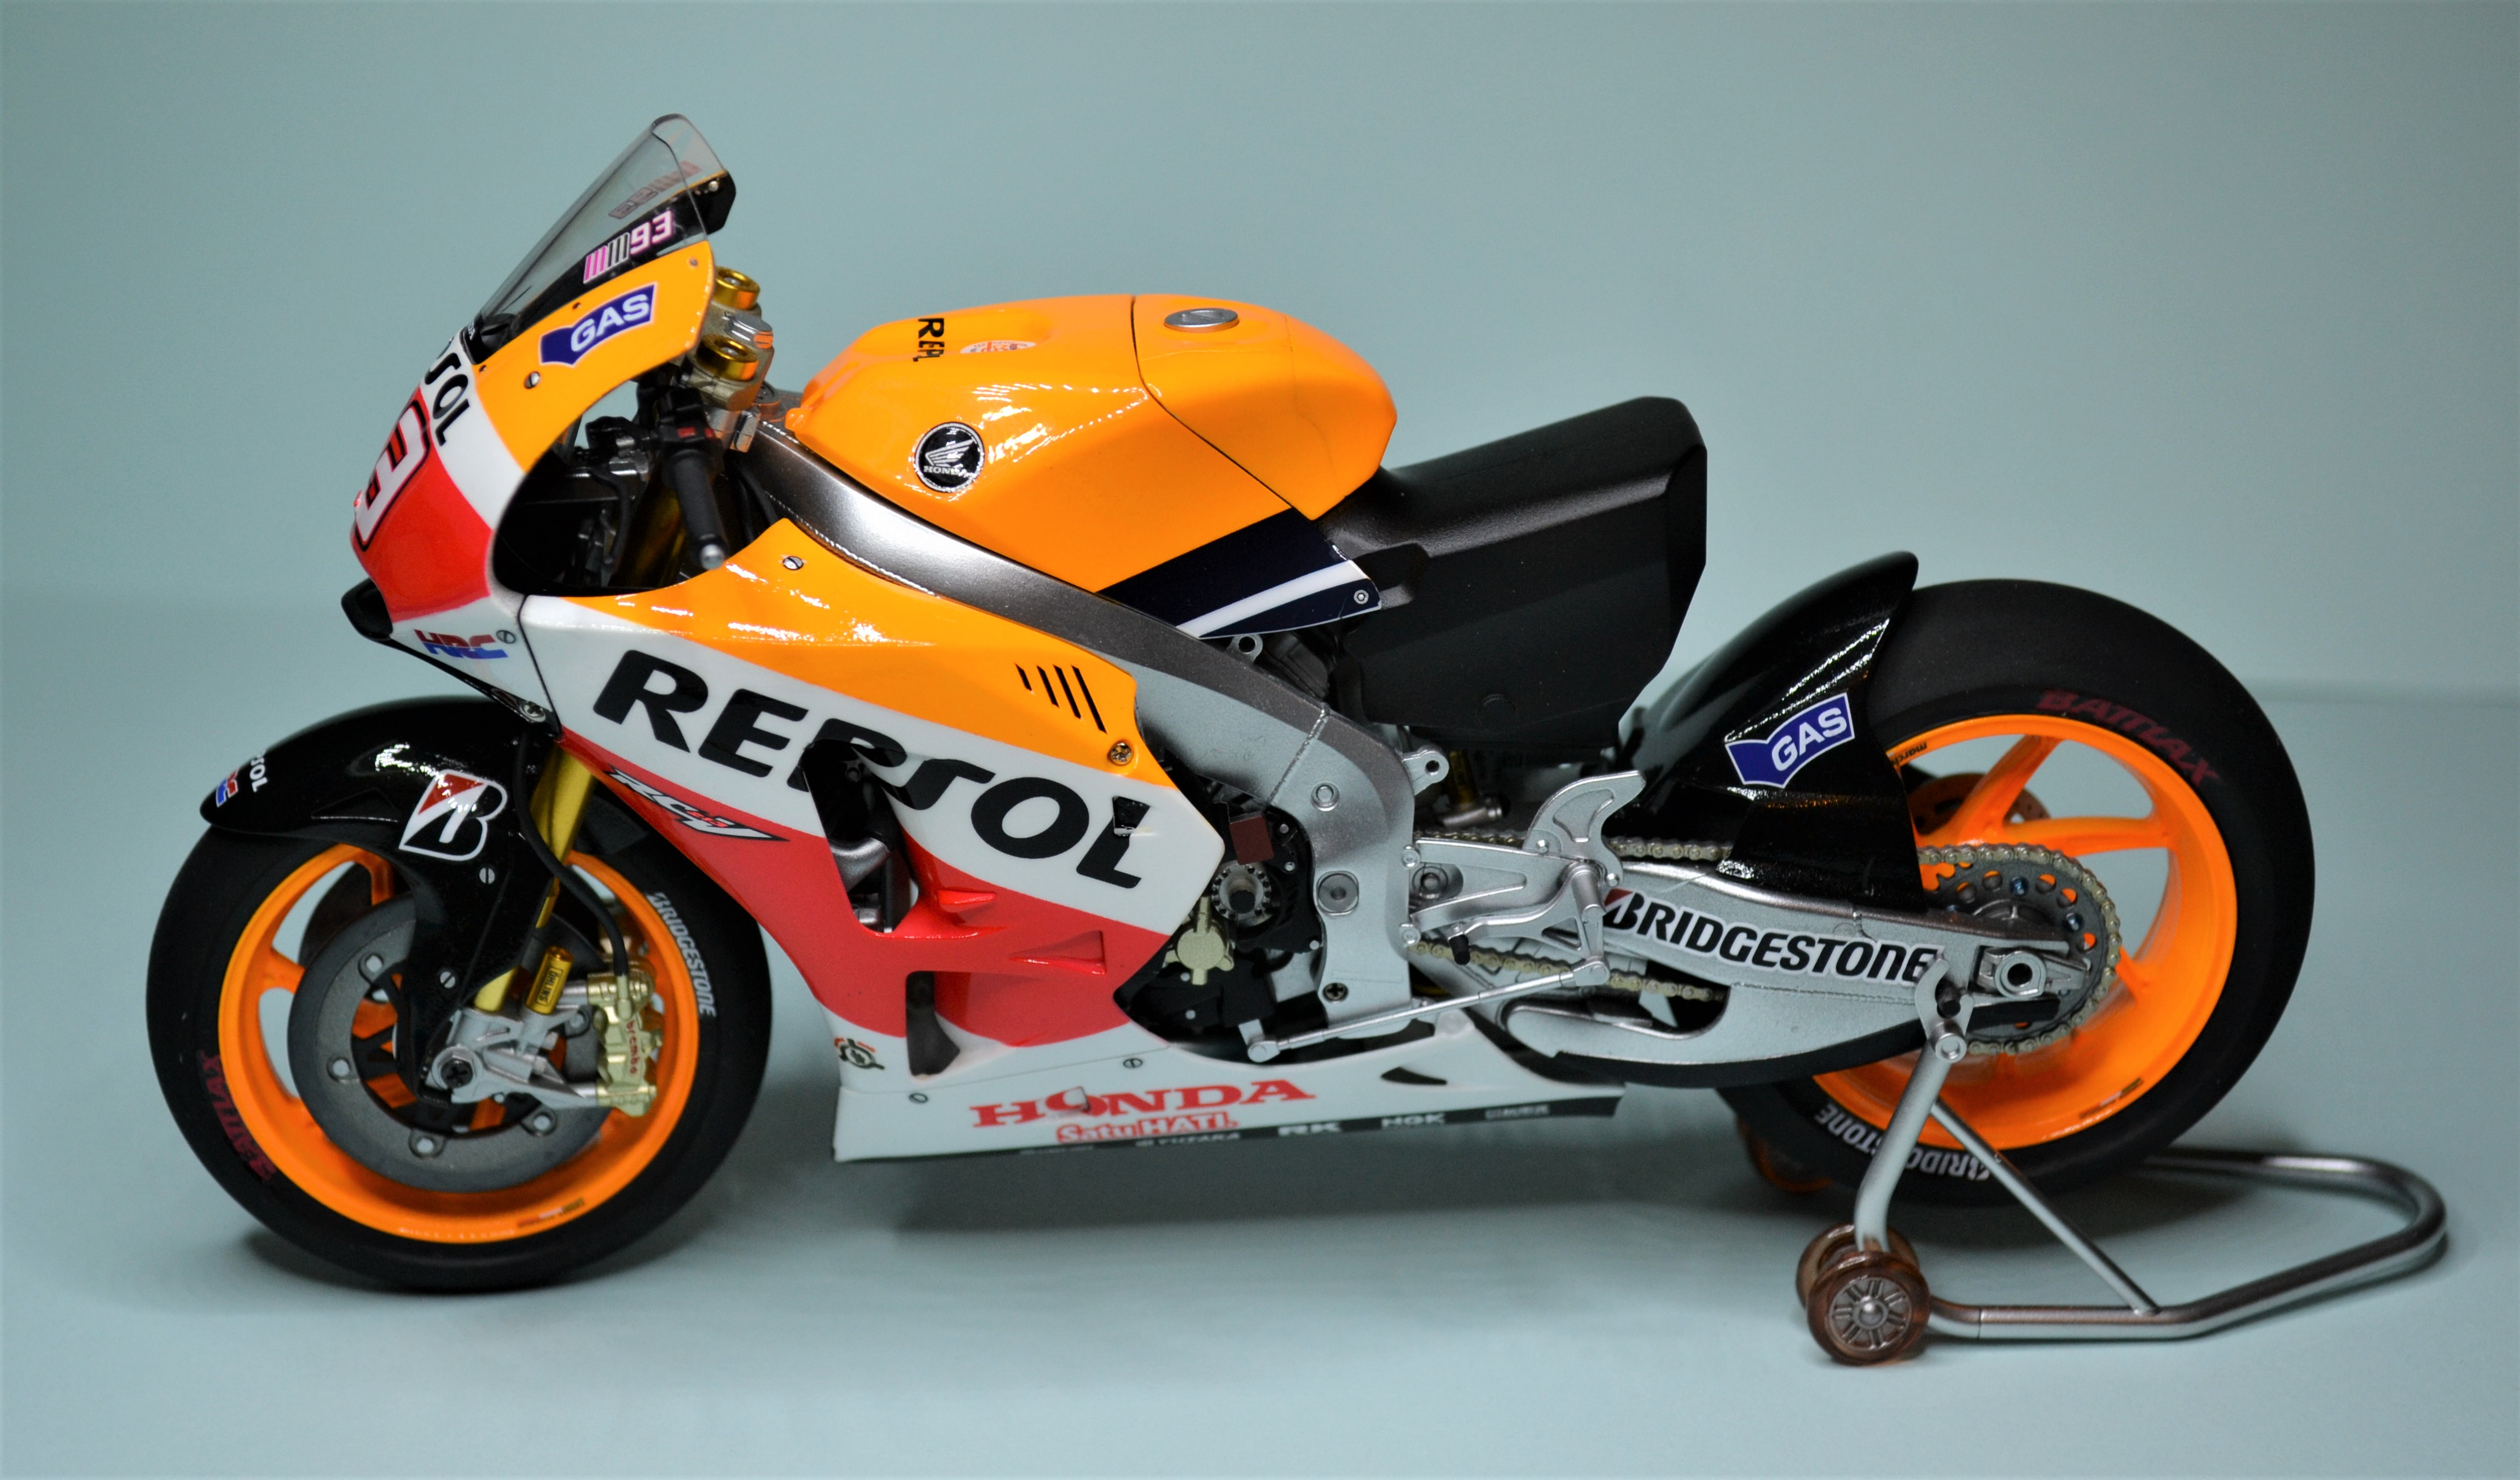 Honda Repsol Marc Marquez 1/12  - Page 2 170729030626358849